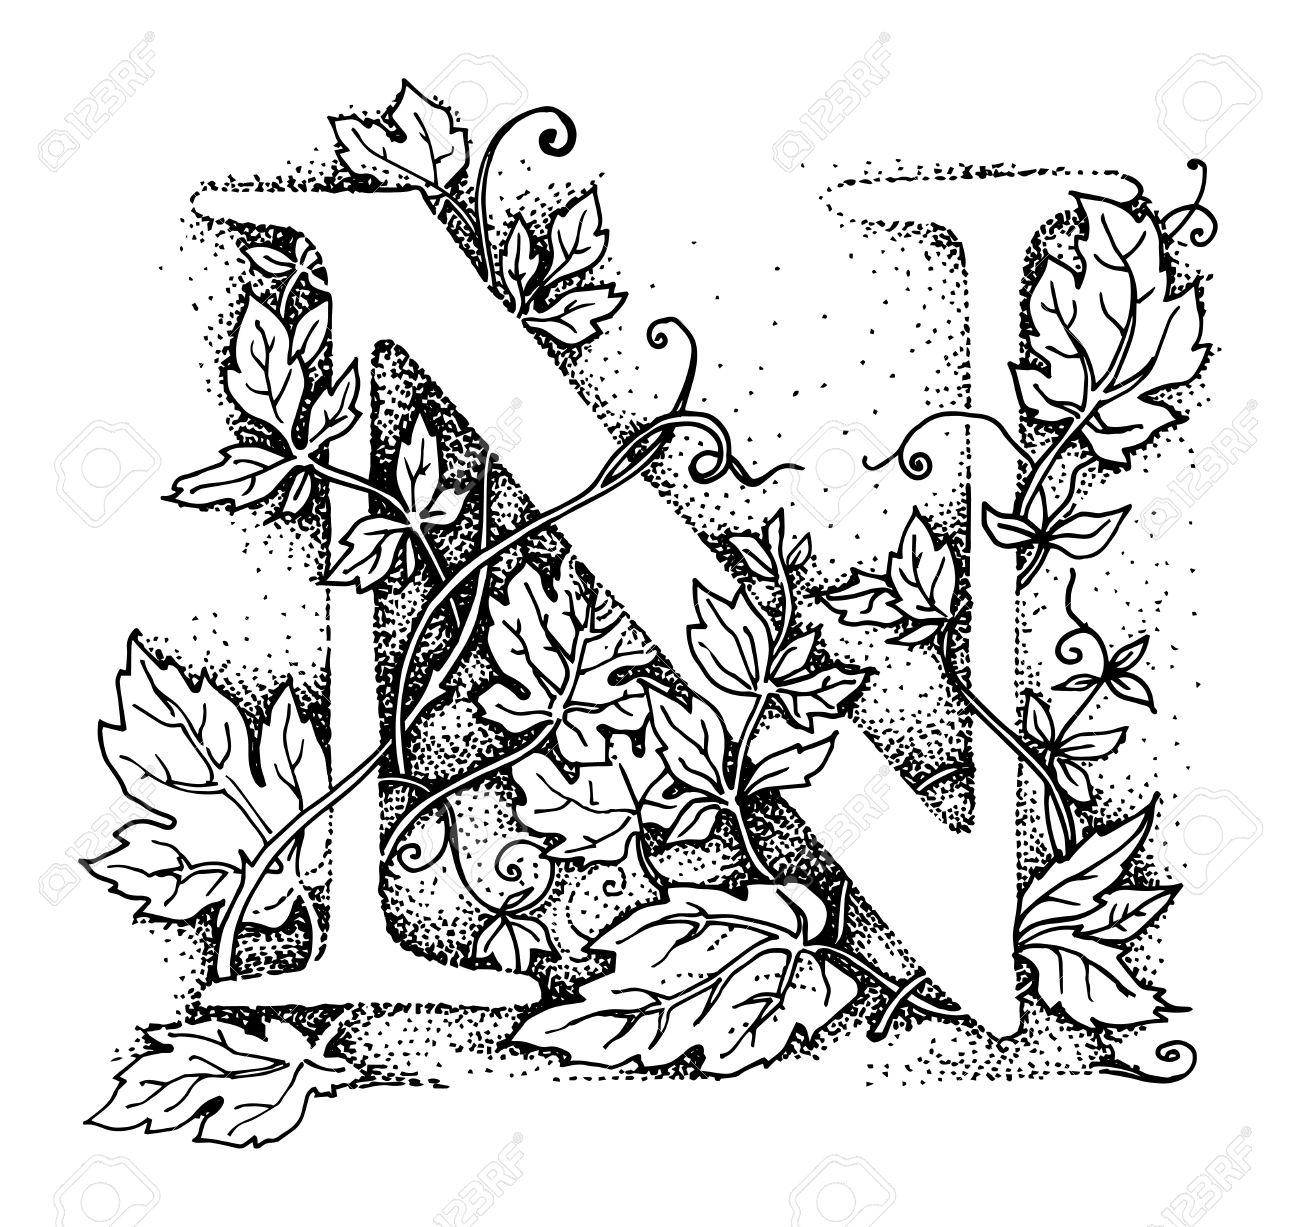 1300x1227 Letter N Alphabet Symbol, Hand Draw Illustration Royalty Free